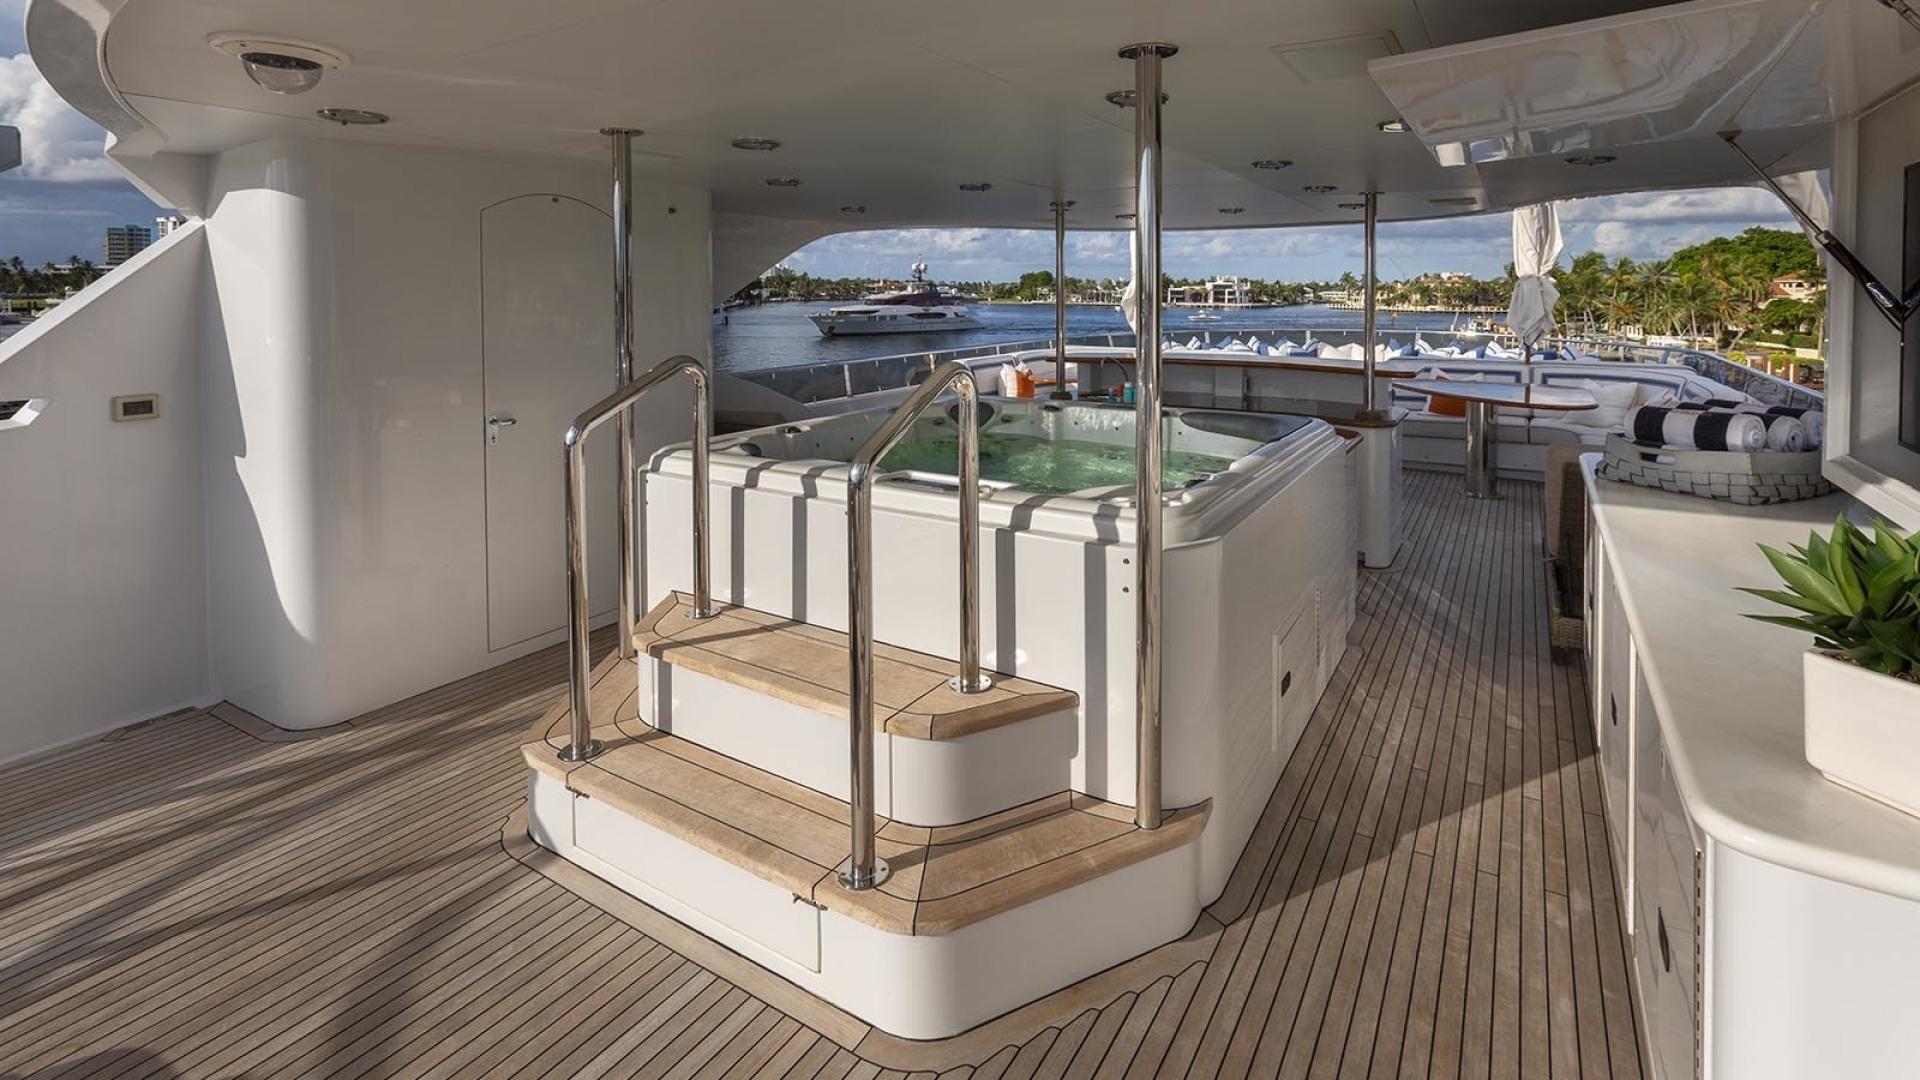 Richmond Yachts-Tri-Deck Motor Yacht 2008-FAR FROM IT St Thomas -Virgin Islands-Virgin Islands (US)-Sun Deck Jacuzzi-1394805 | Thumbnail